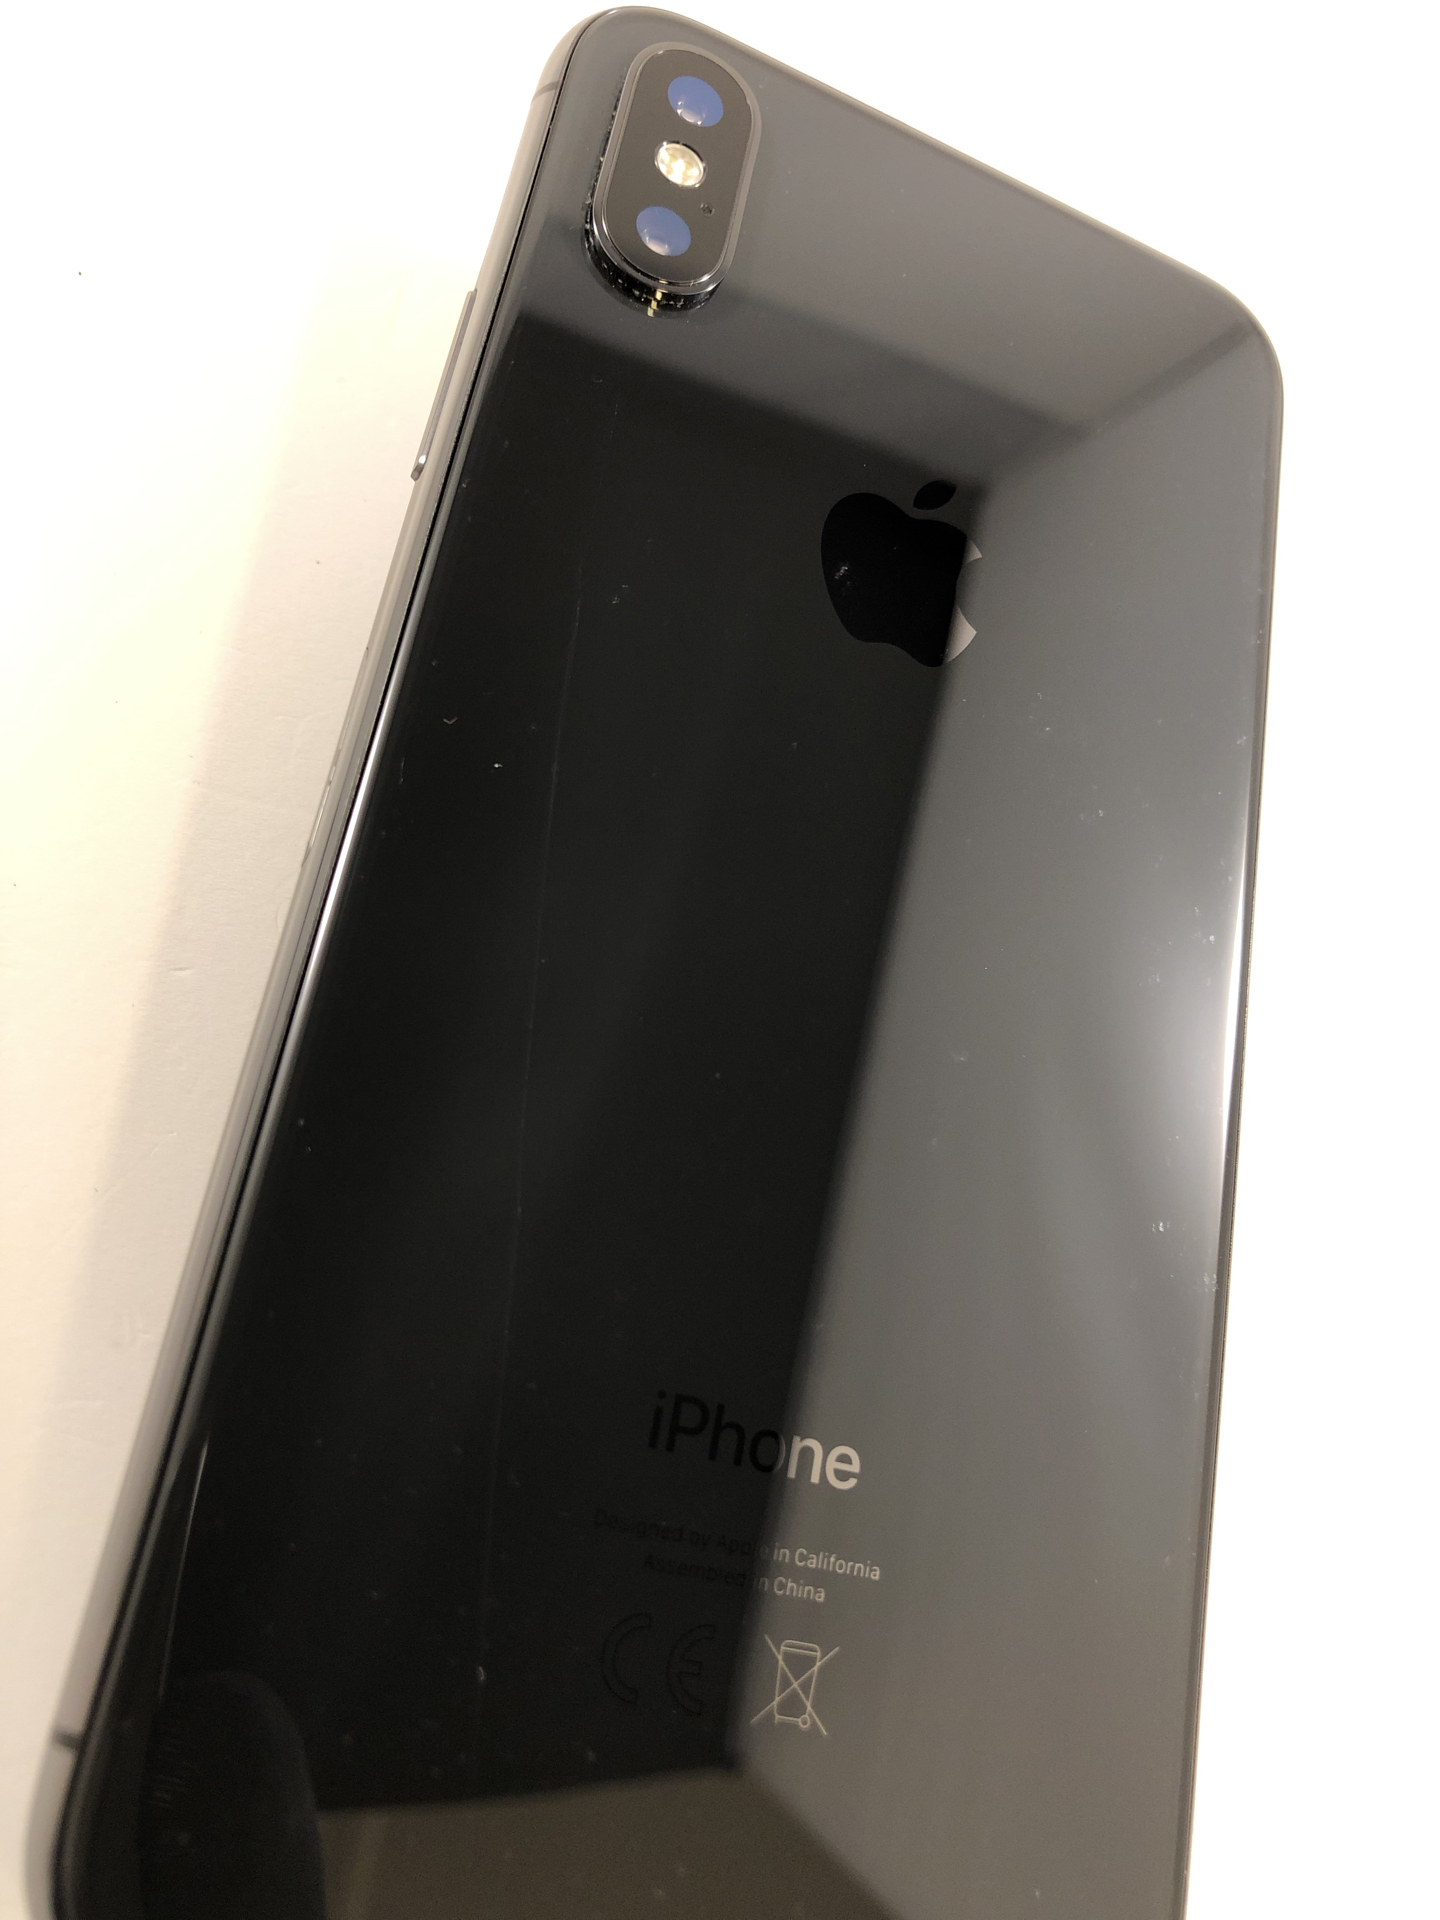 iPhone X 64GB, 64GB, Space Gray, image 5